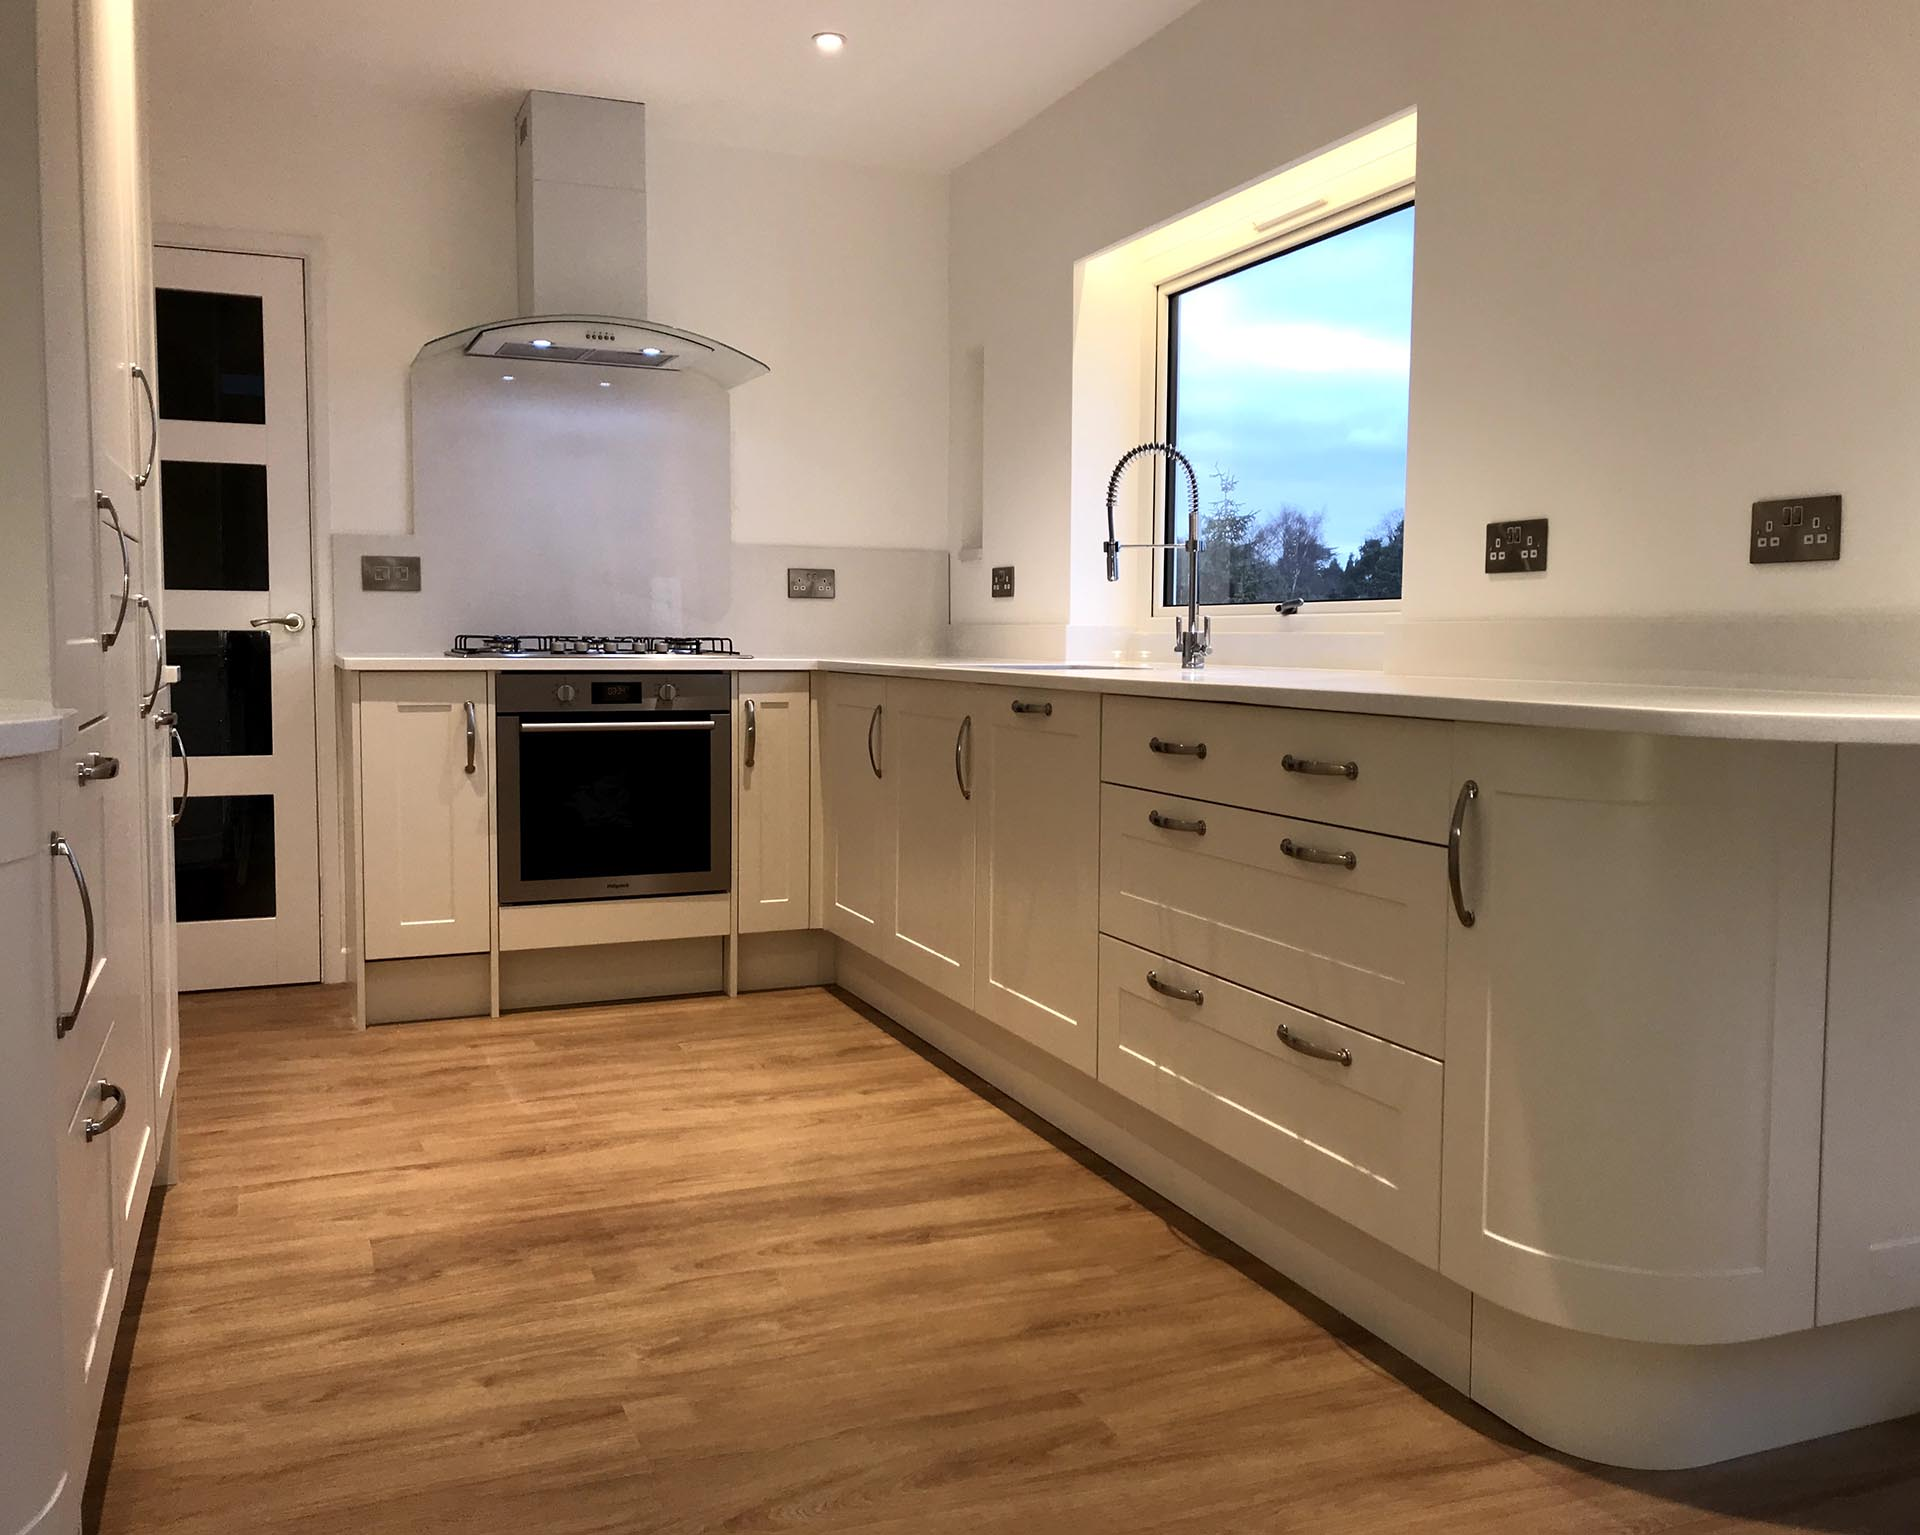 New kitchen builders near Borough Green